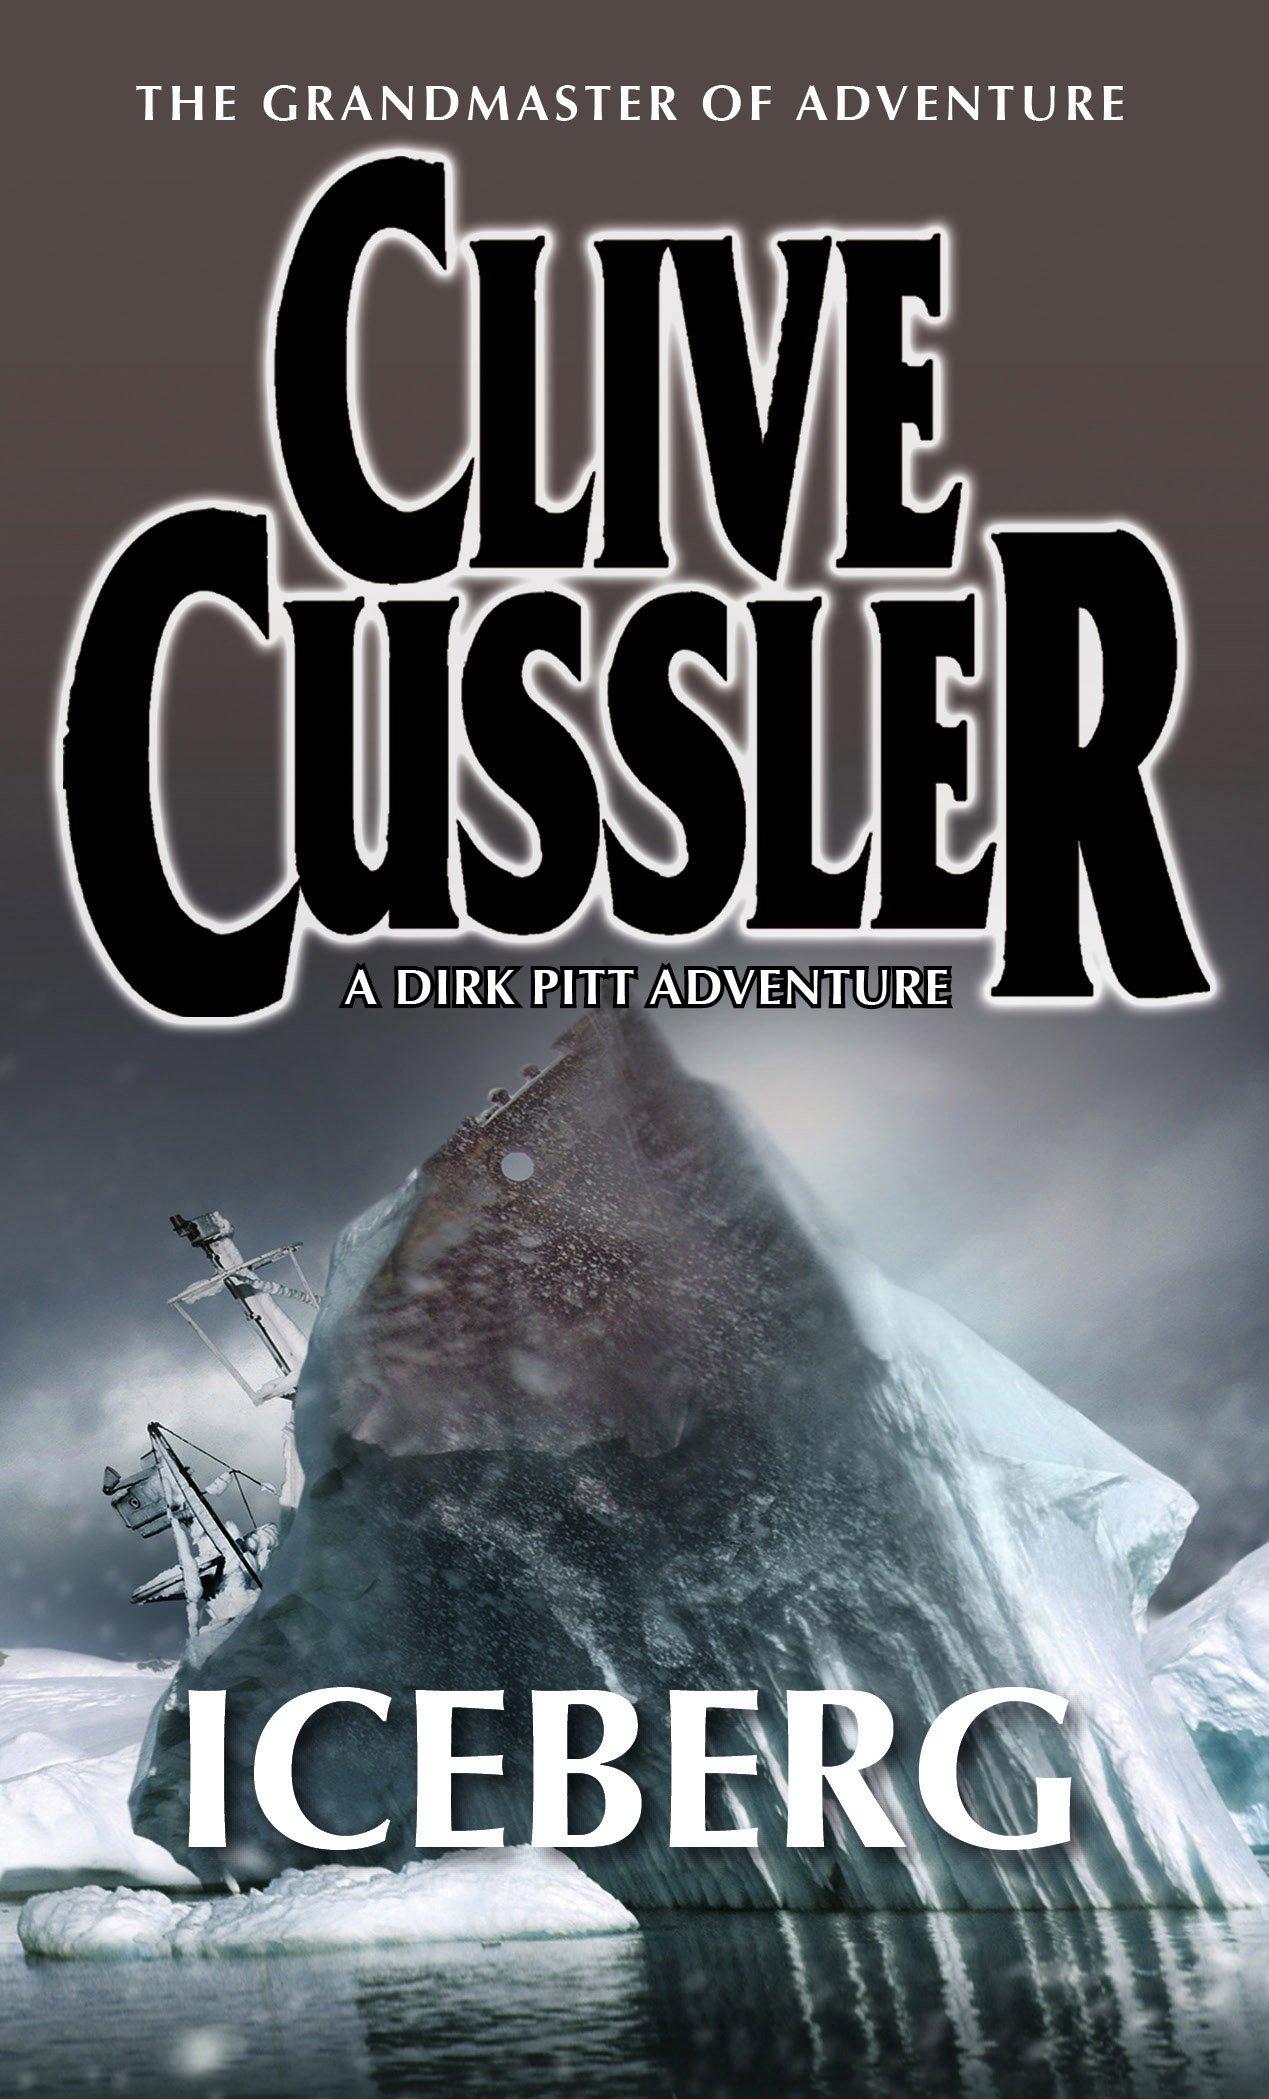 Buy Iceberg (Dirk Pitt) Book Online at Low Prices in India   Iceberg (Dirk  Pitt) Reviews & Ratings - Amazon.in